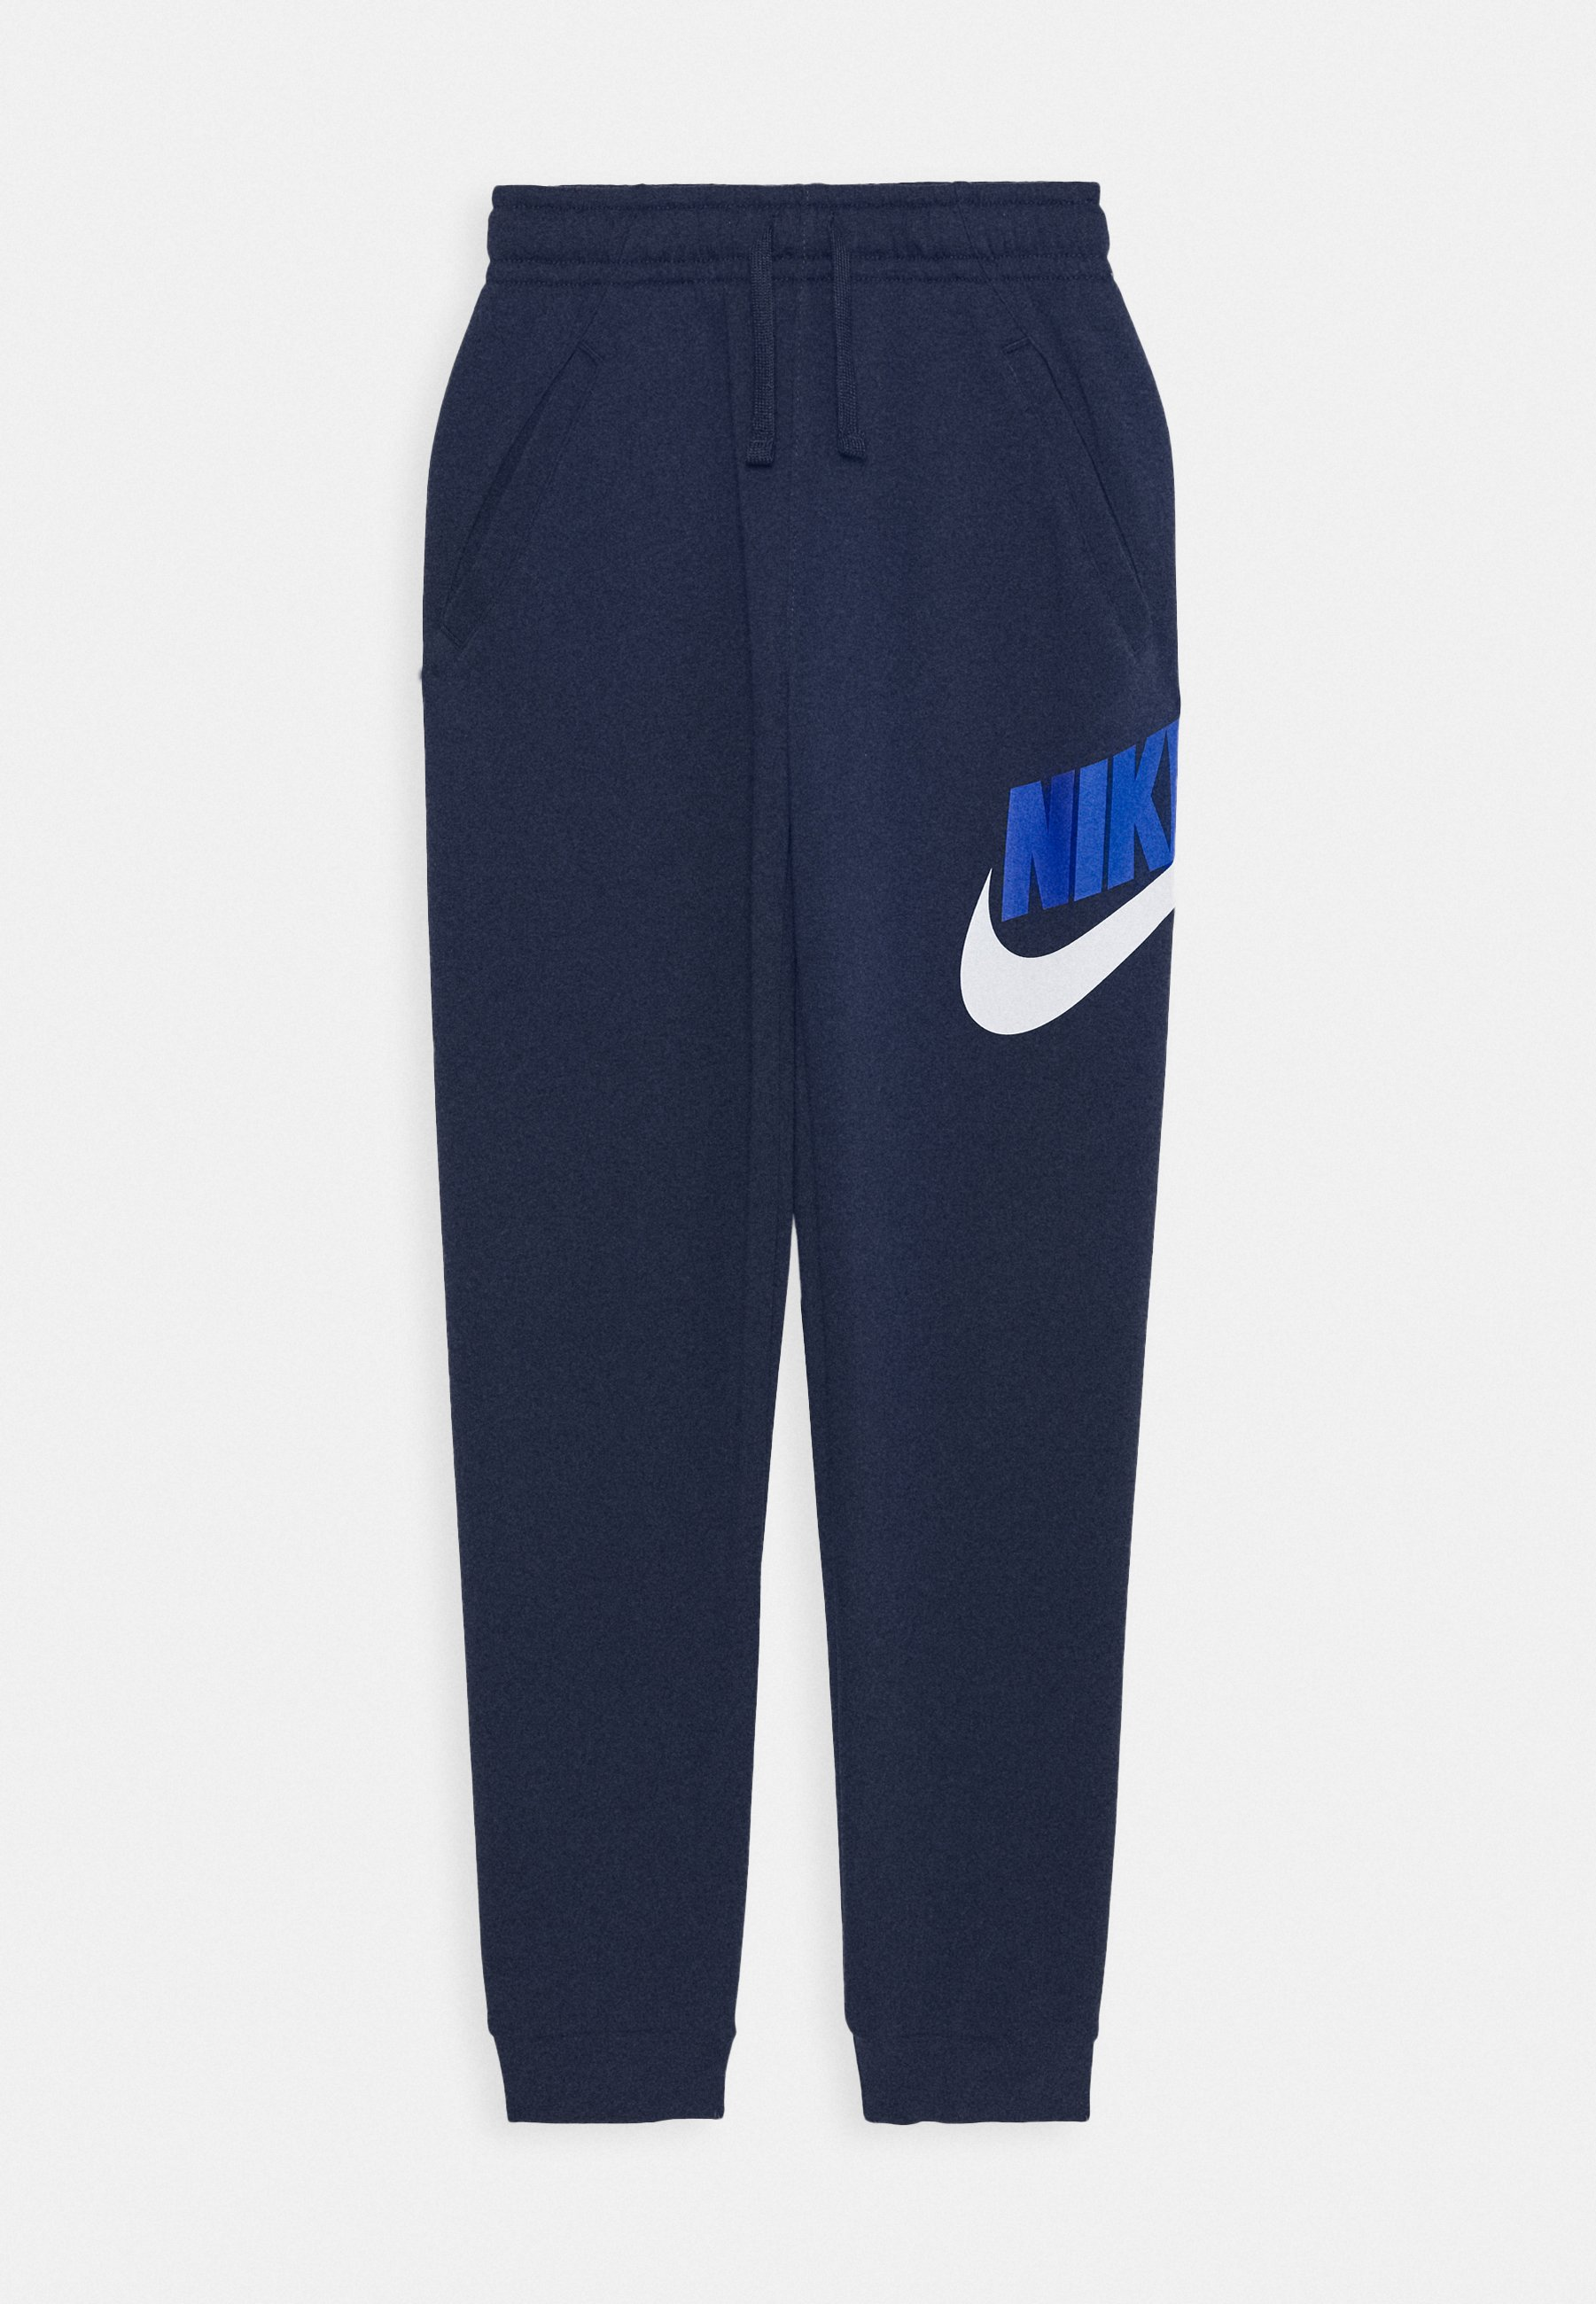 CLUB PANT Pantalon de survêtement midnight navy